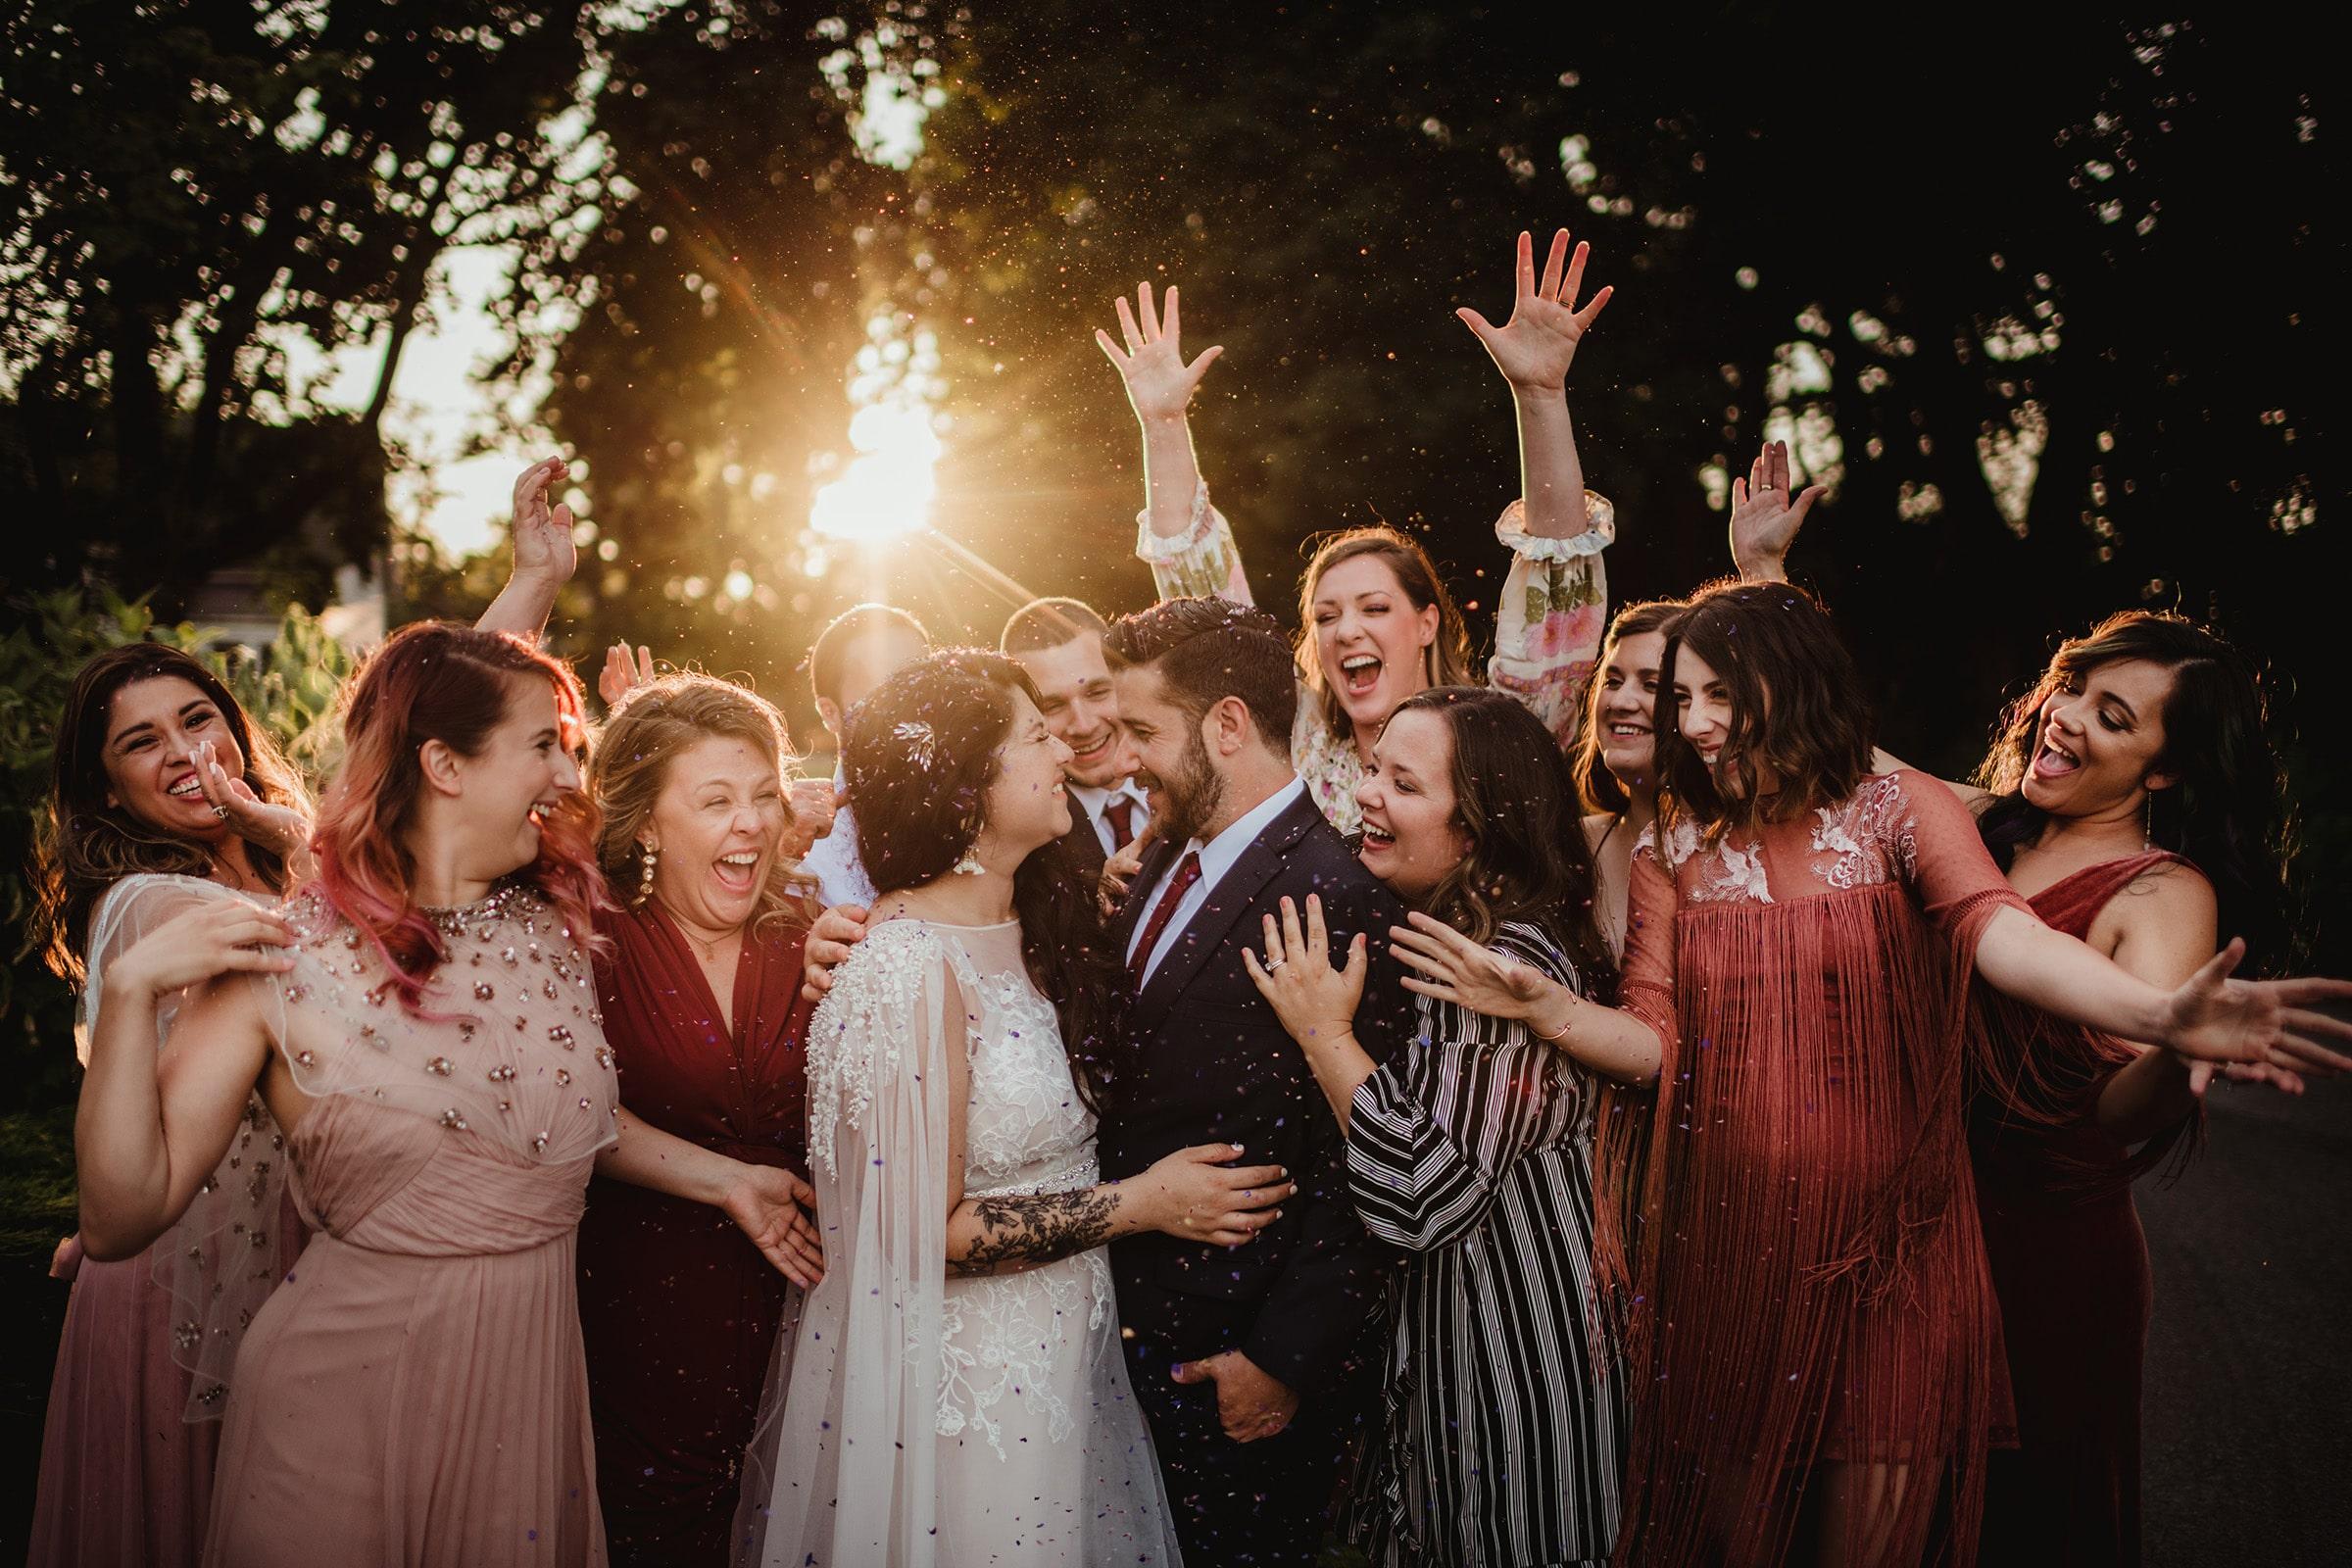 Wedding Giveaway Bridal Party Celebrating